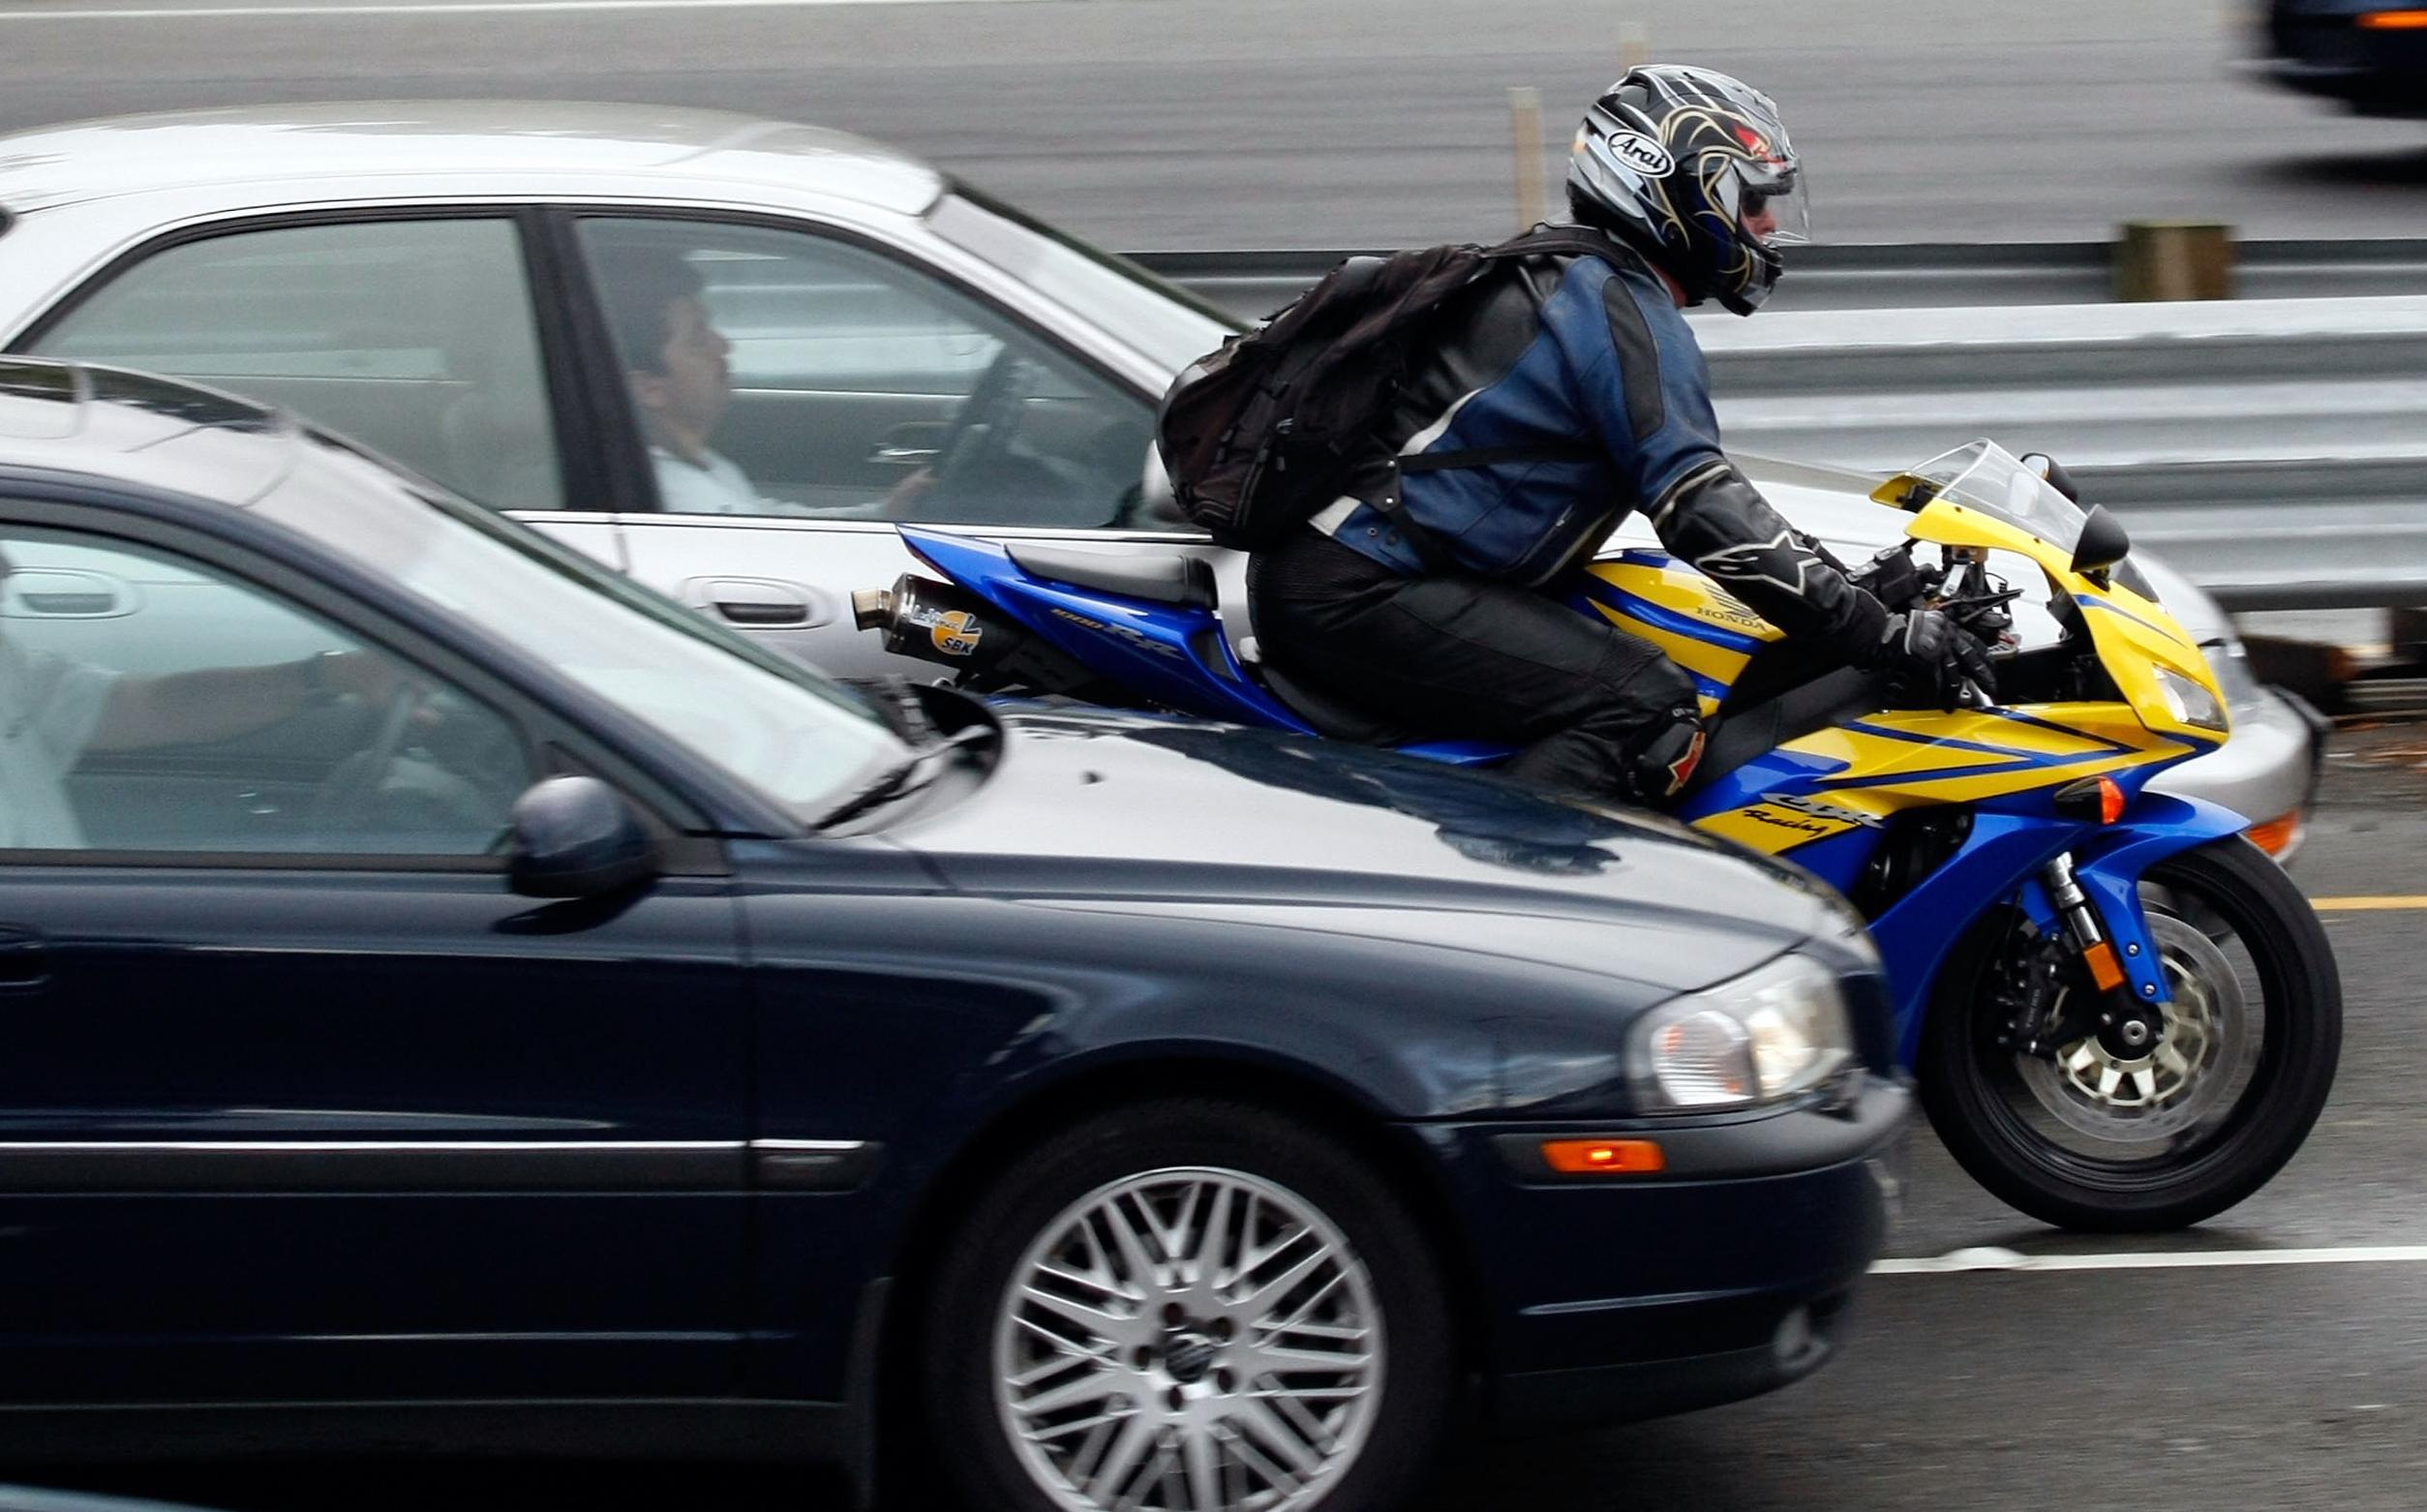 bike_in_traffic